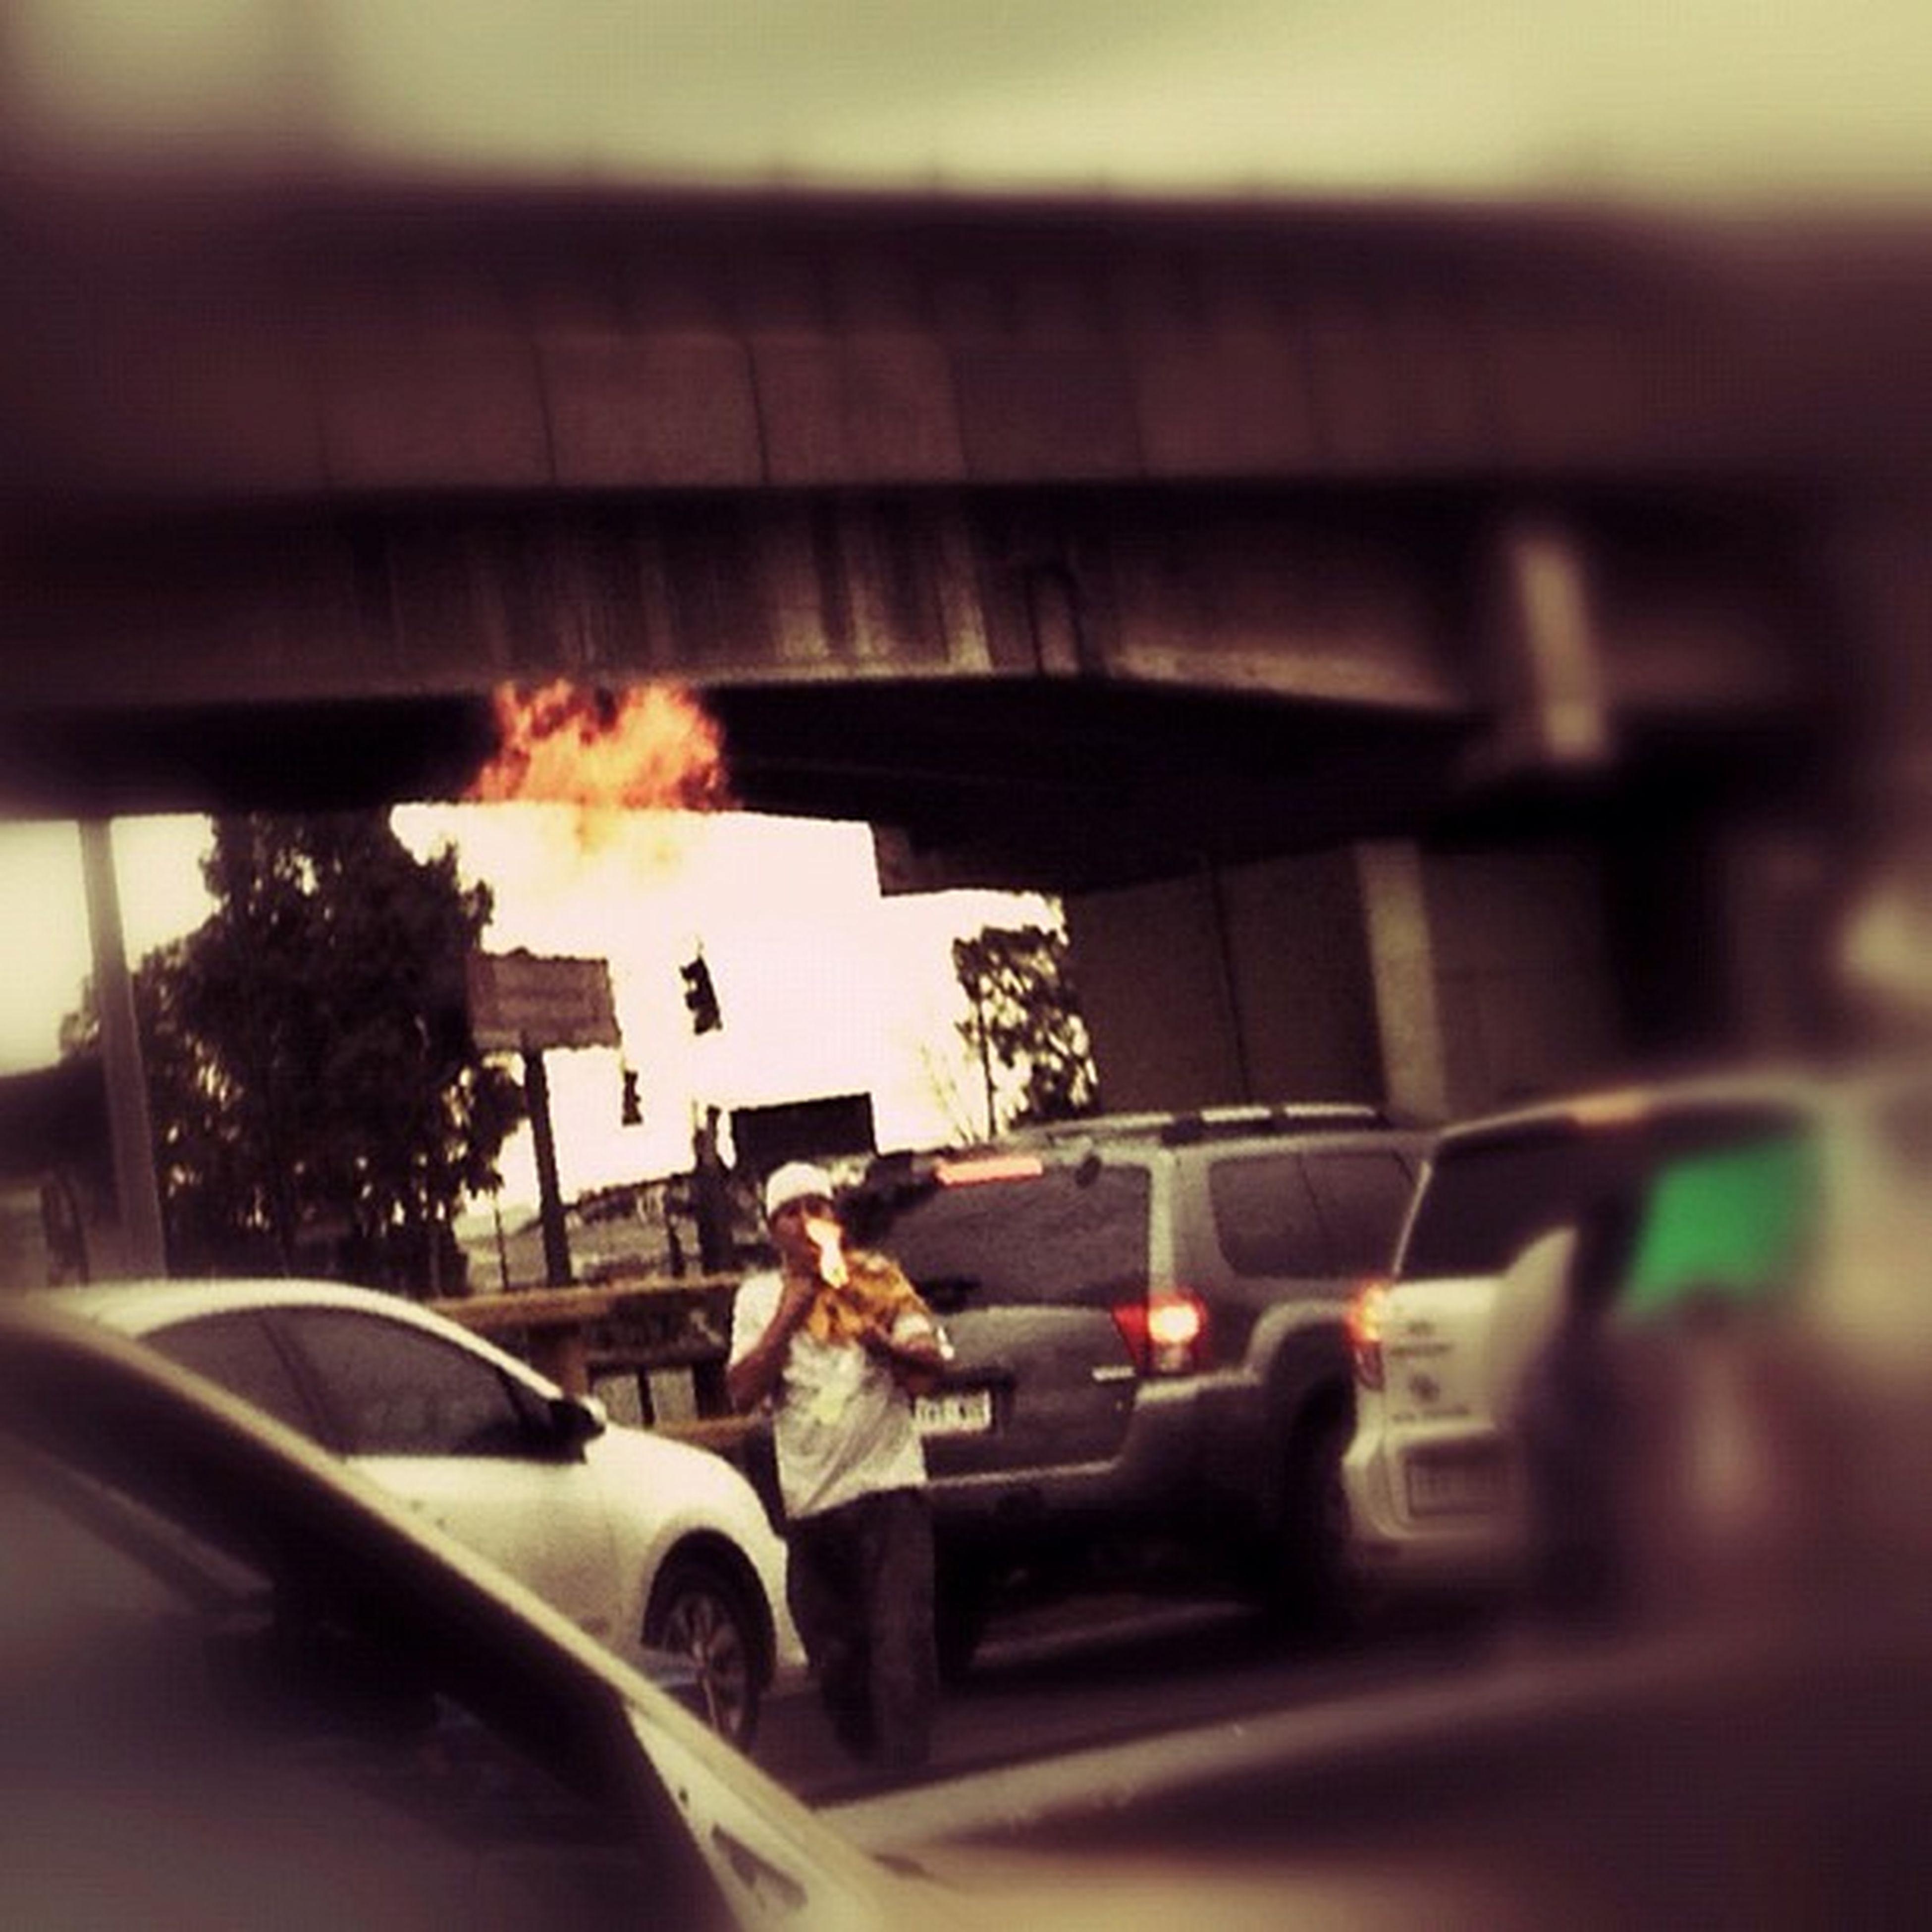 Tragafuego Fireman Urban Mexicocity  df traffic iphoneonly instahub iphone4s instagood instamood iphonesia picoftheday photooftheday fotodeldia mextagram mexico lalojm1 2012